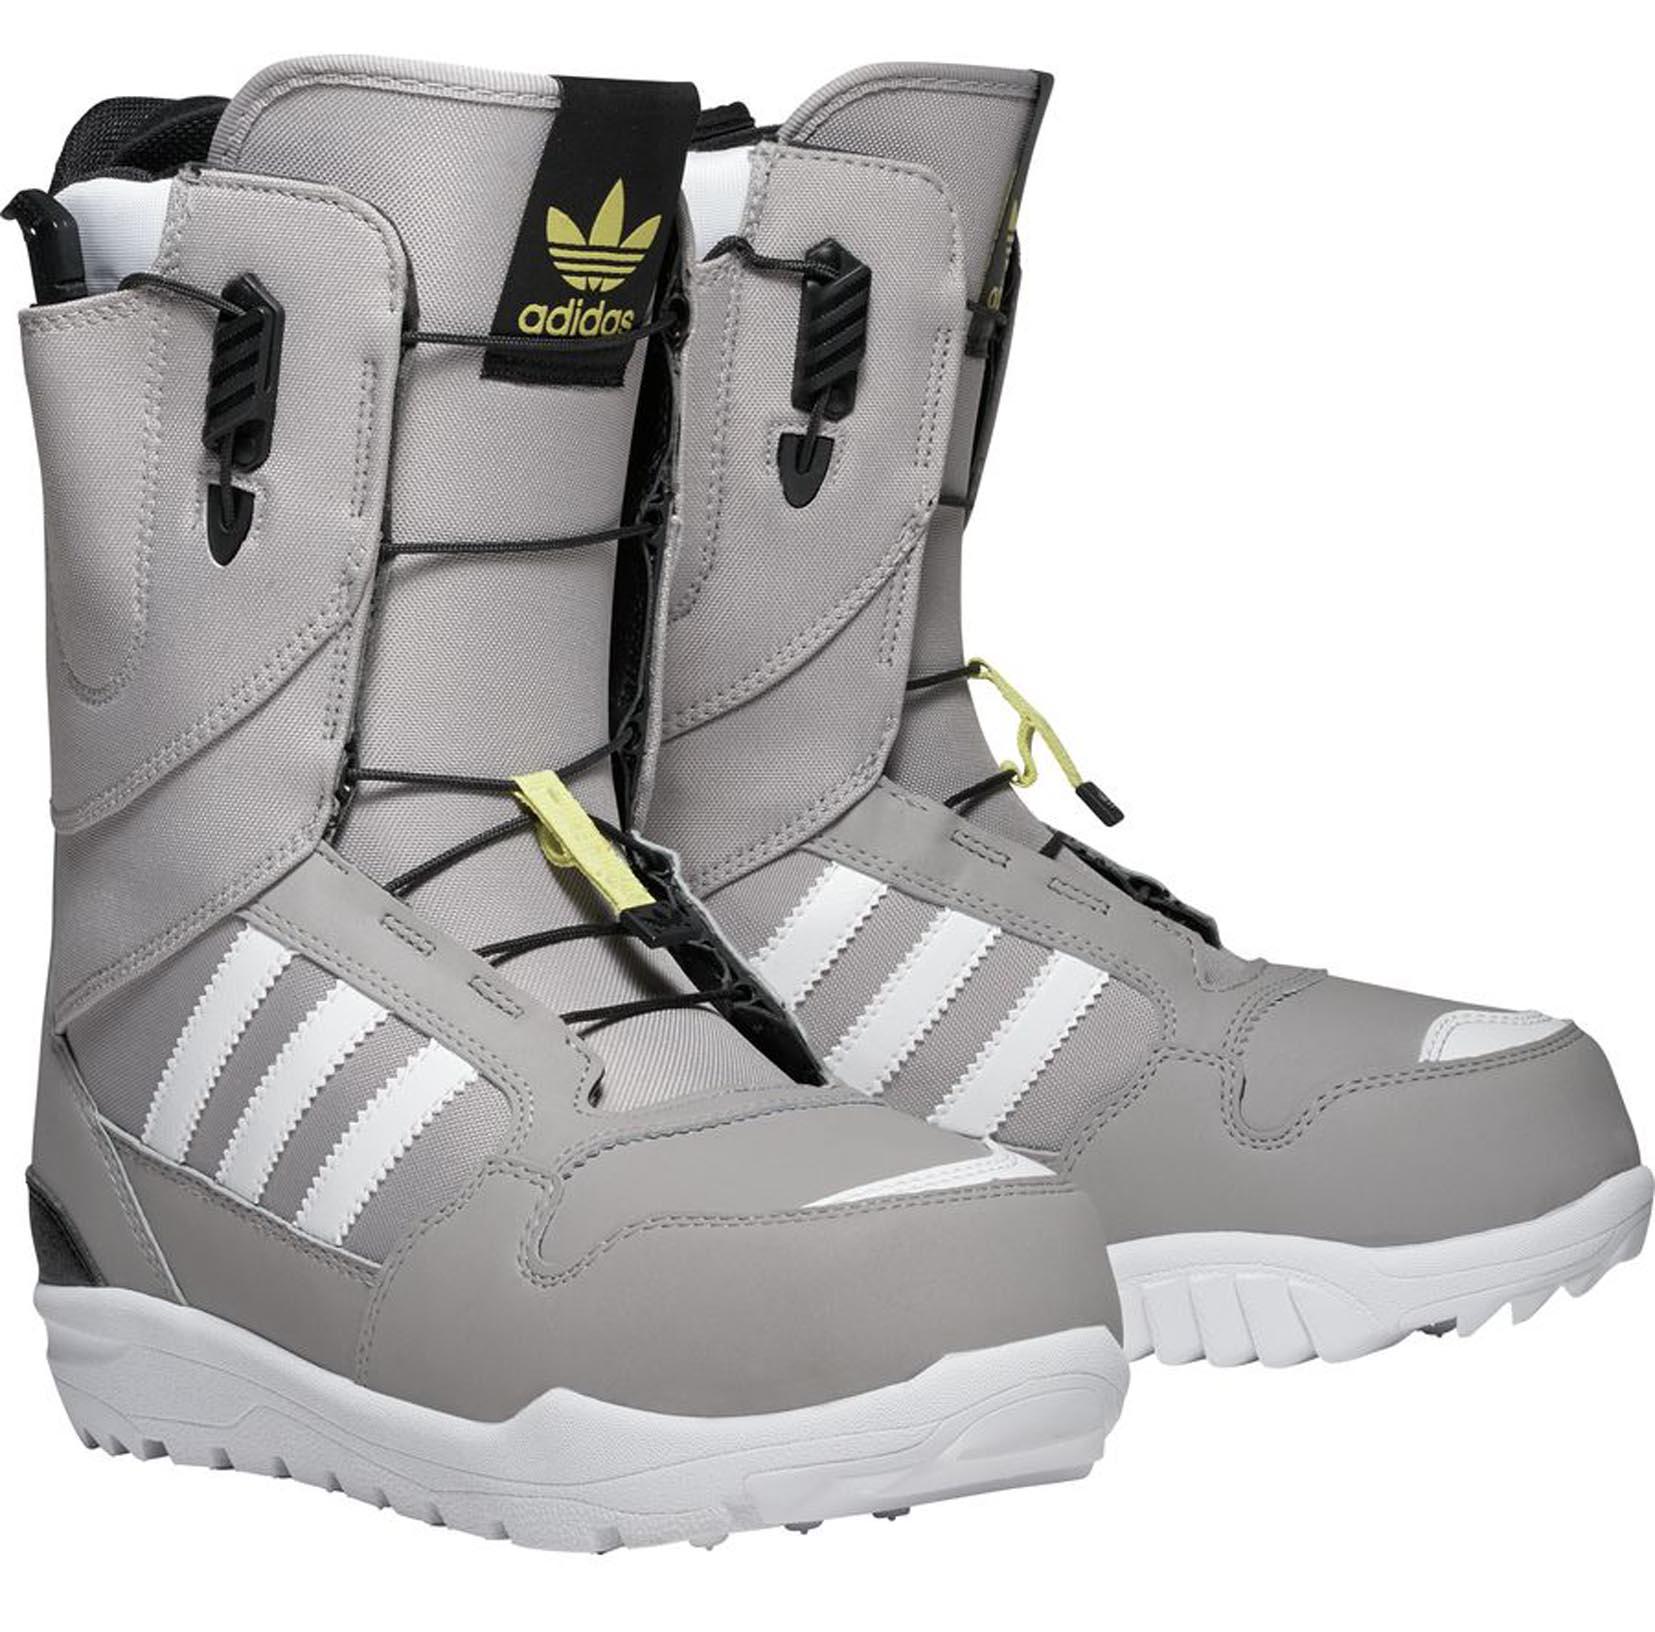 image adidas-zx-500-jpg